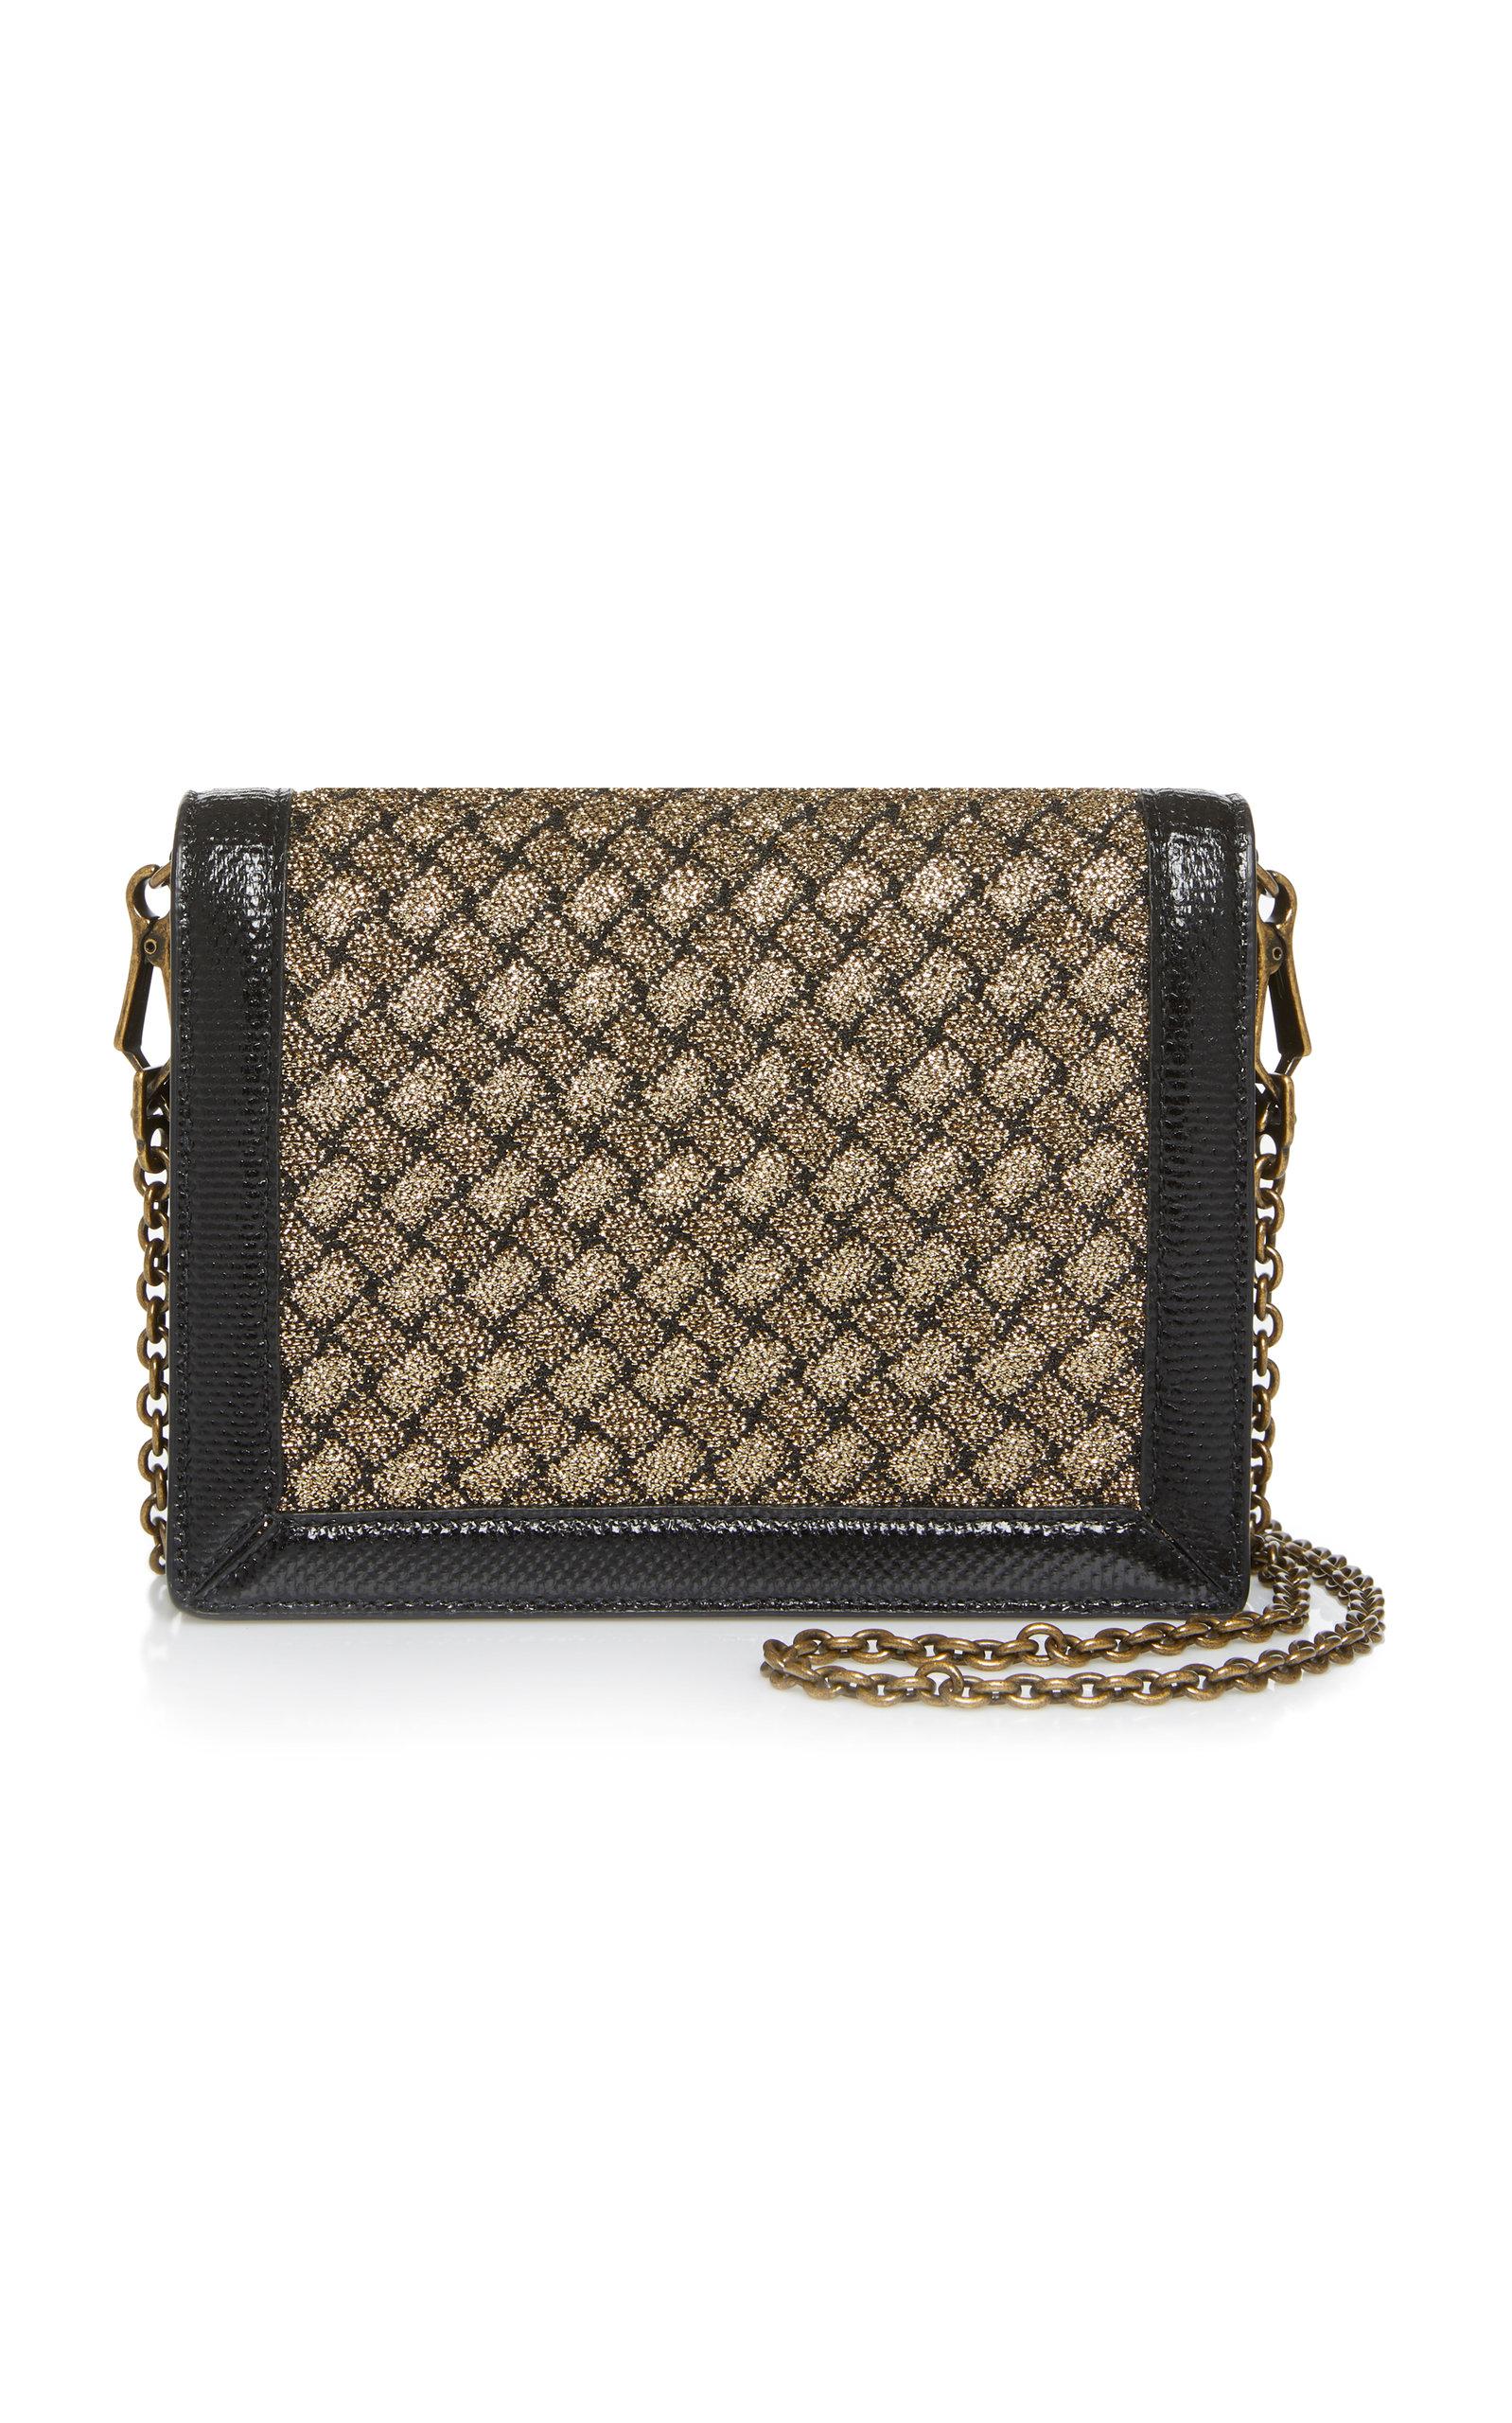 Montebello Leather Bag Bottega Veneta 2S4cV2HAp